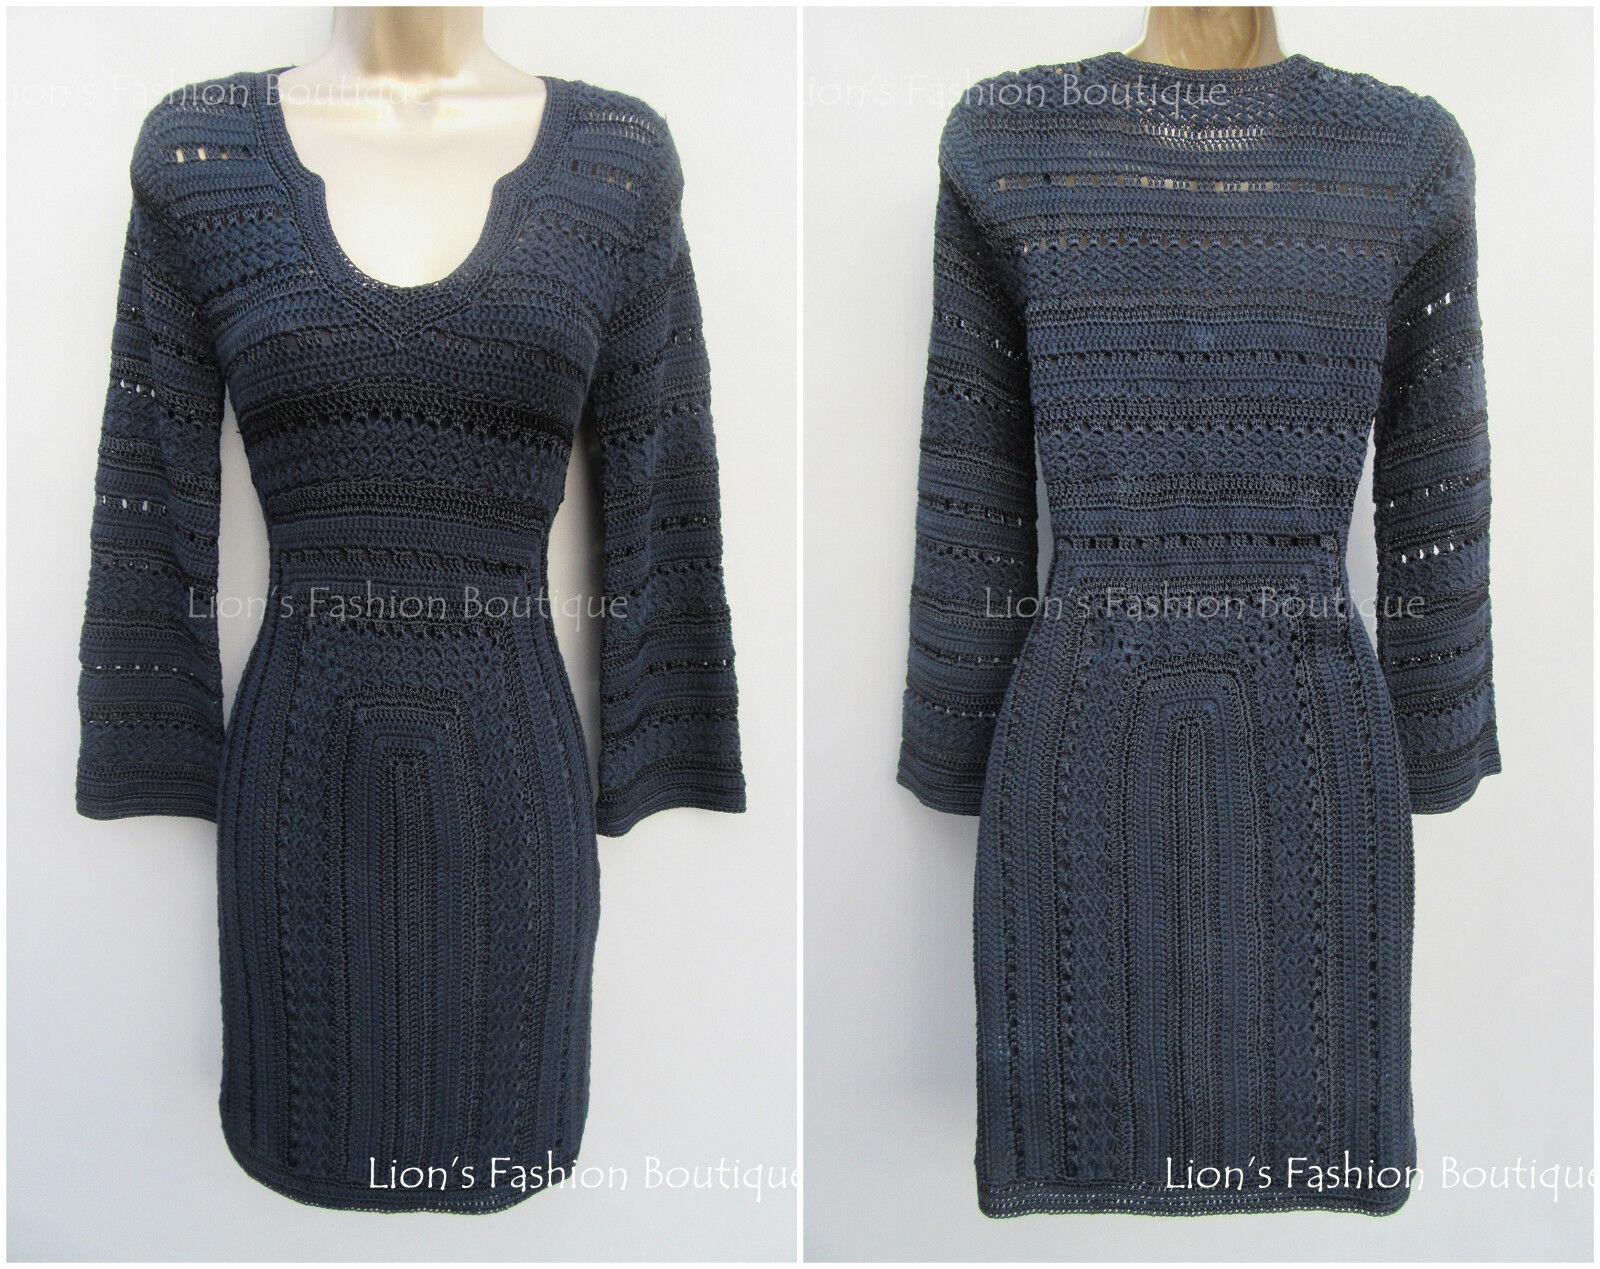 New KAREN MILLEN schwarz BNWT  Crochet Knit Evening Bodycon Bandage Dress